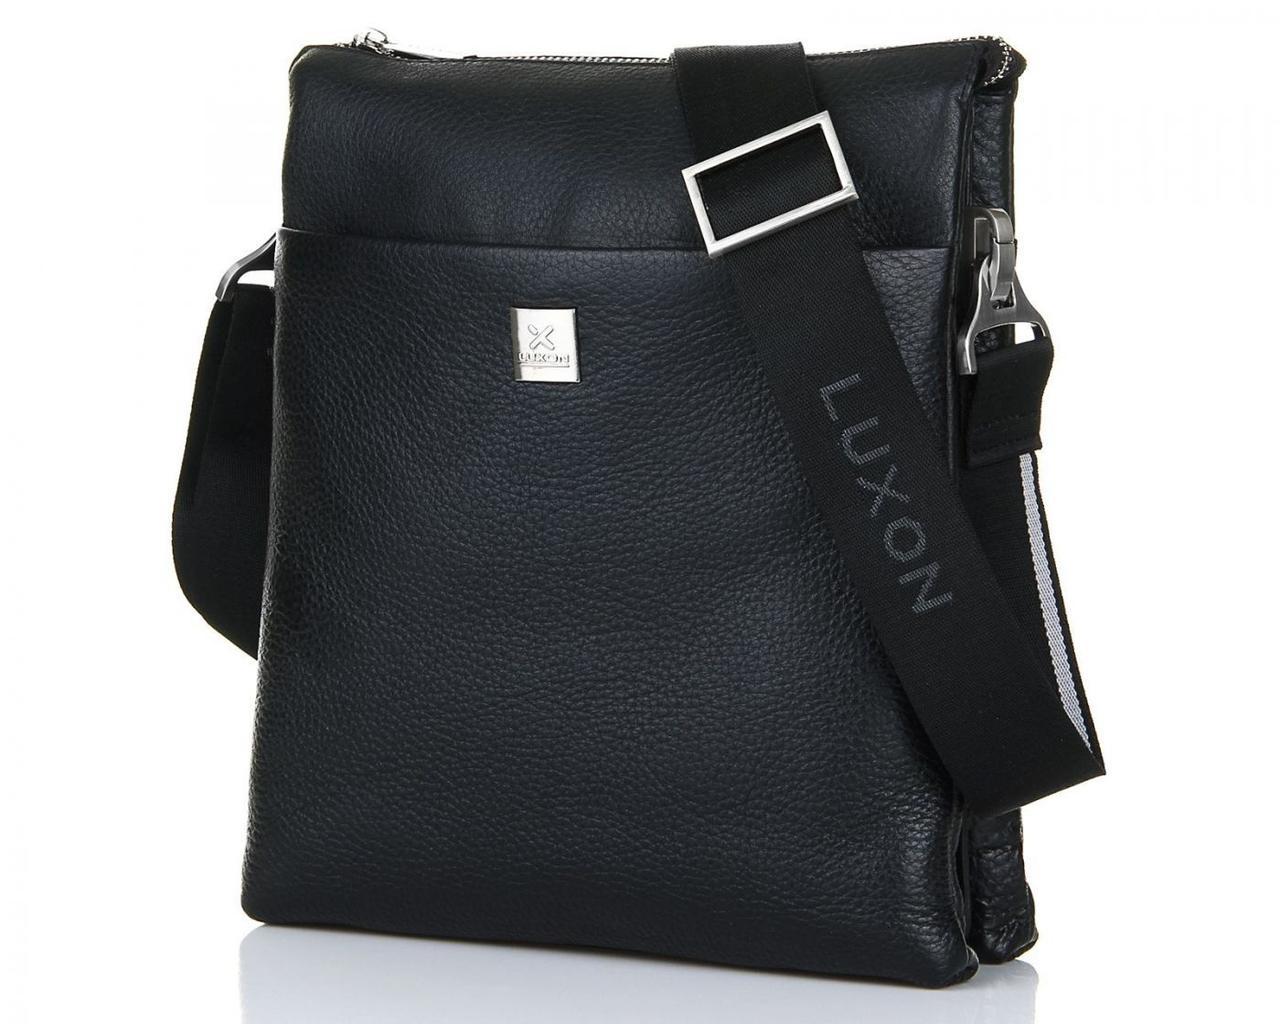 Мужская сумка без клапана Luxon 8832-2